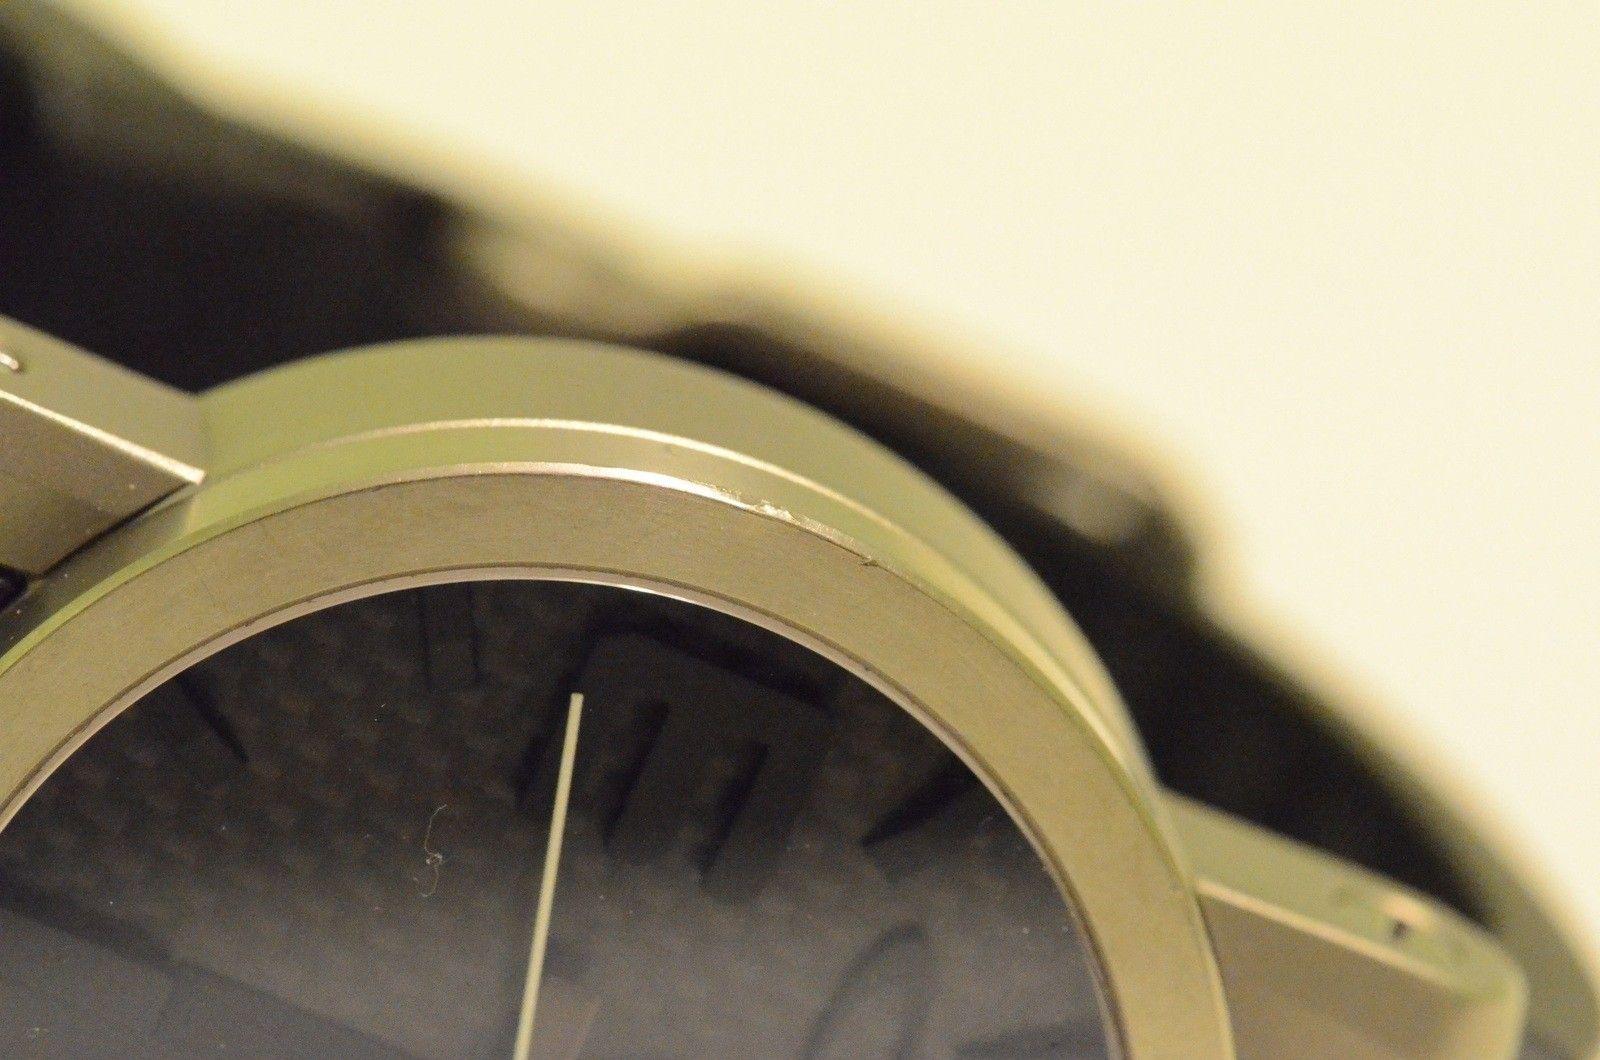 Gearbox Brushed Titanium- Carbon Fiber Dial SOLD! - DSC_0448.JPG